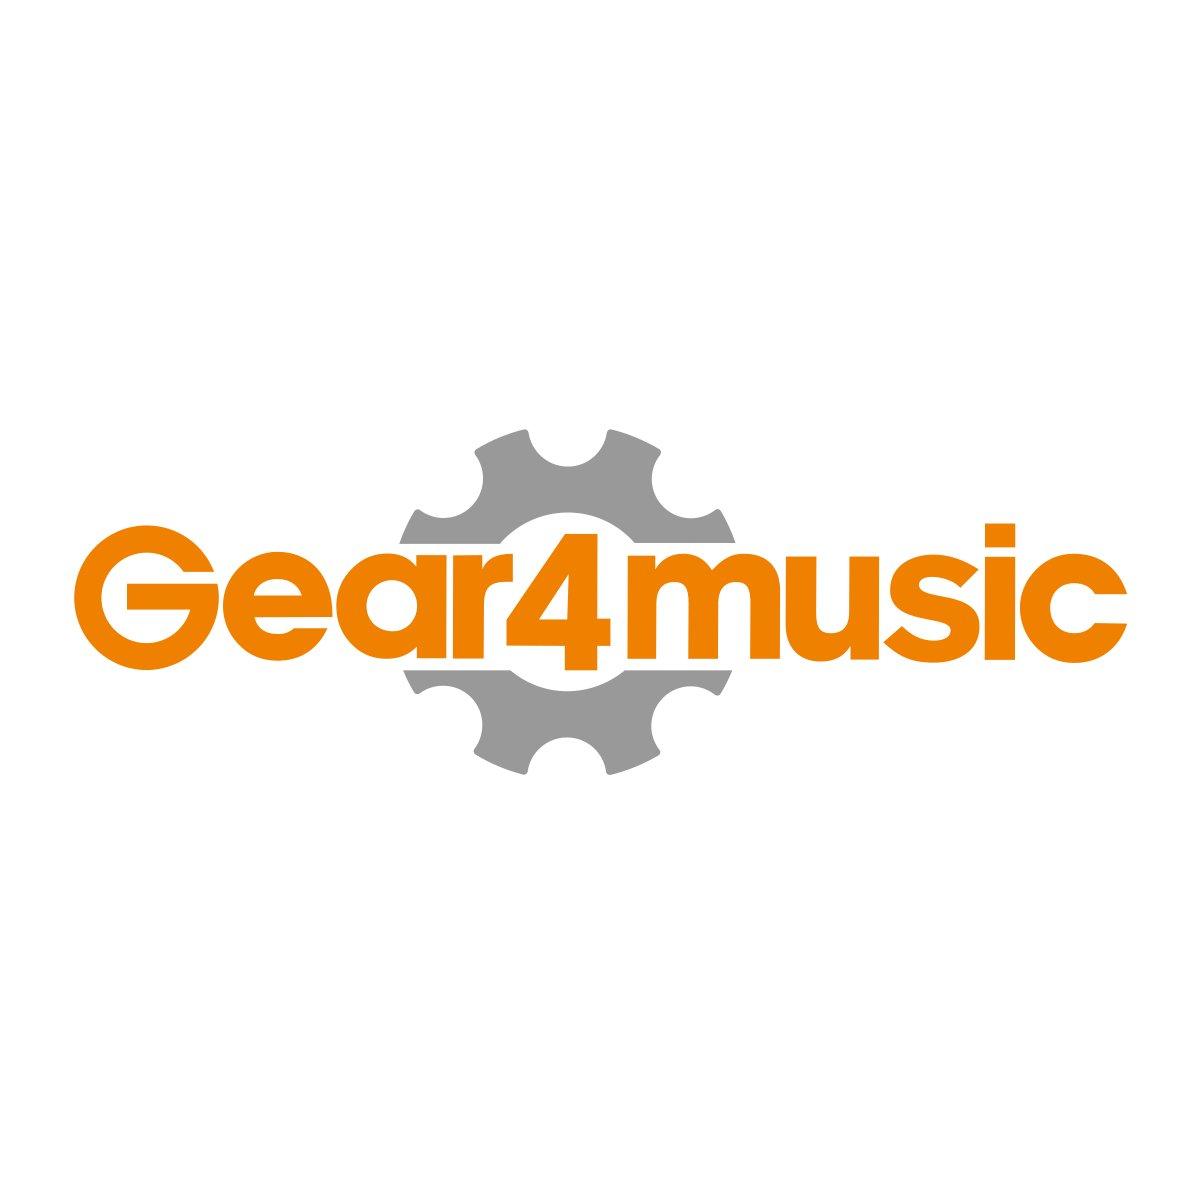 guitare electro-acoustique a dos rond deluxe par gear4music naturel